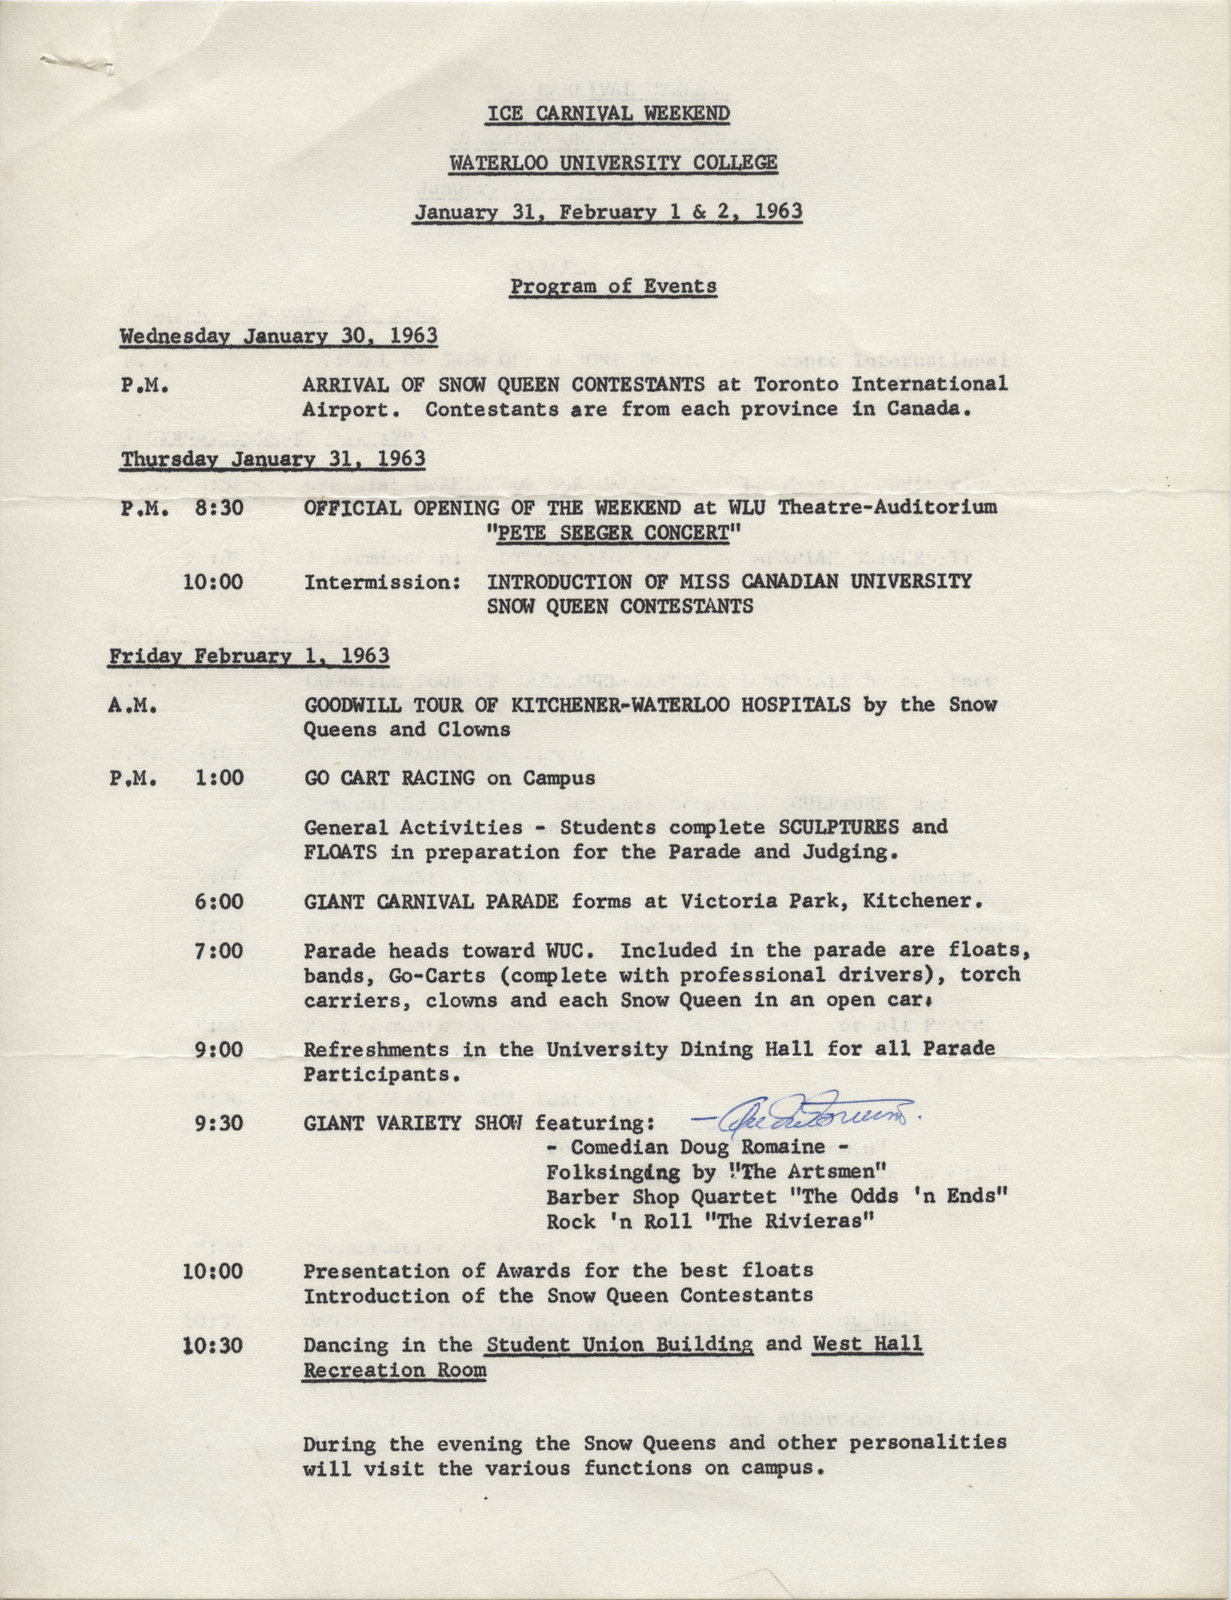 Ice Carnival Weekend, Waterloo University College, January 31, February 1&2, 1963 : program of events